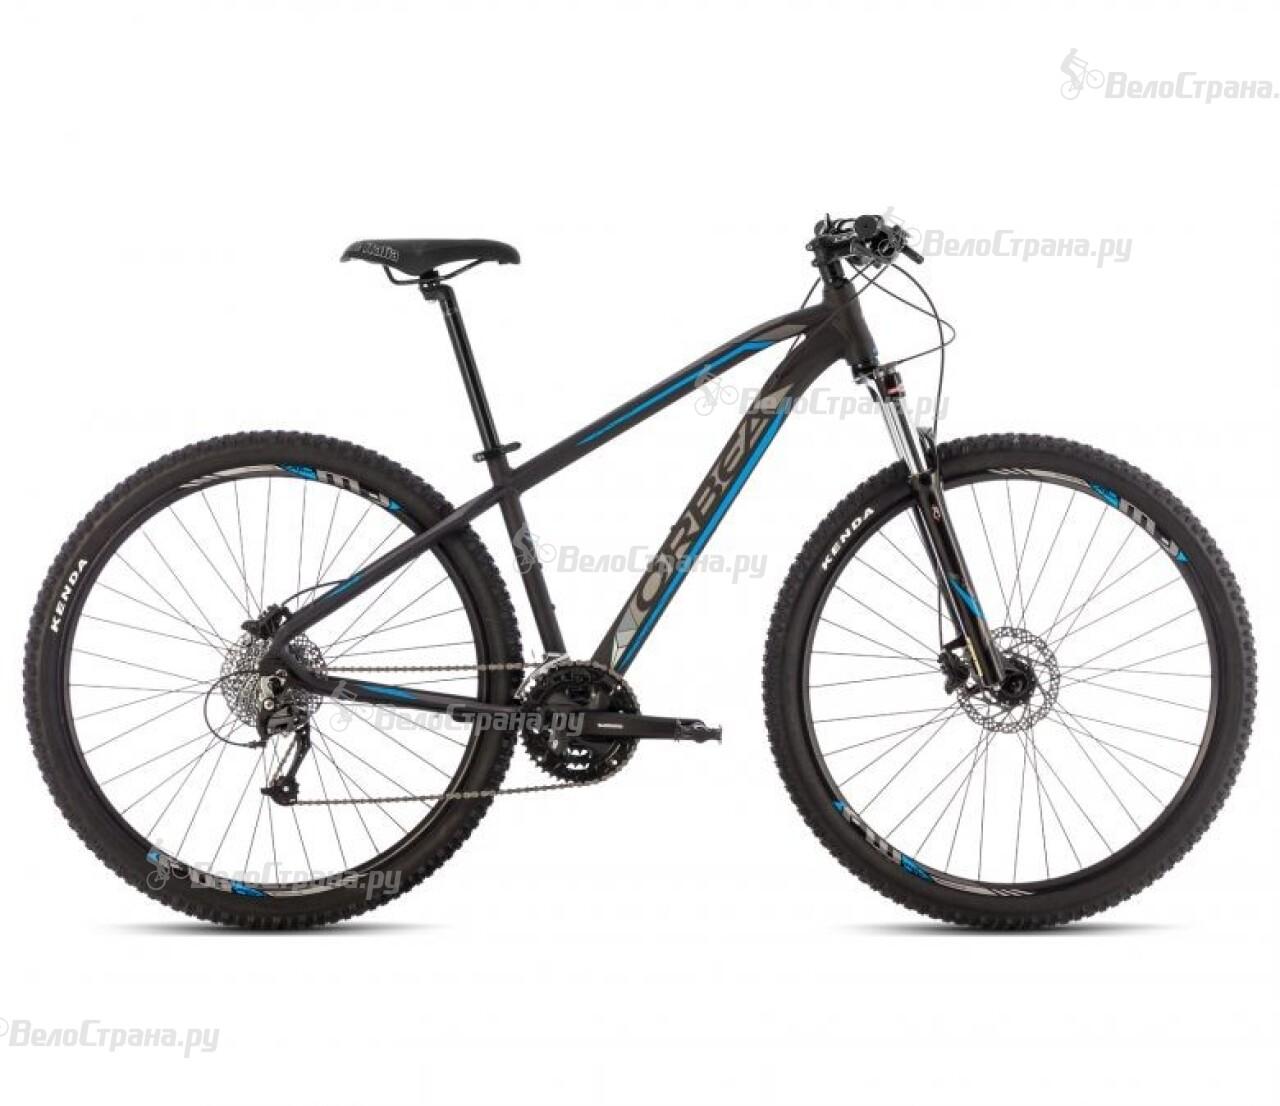 все цены на Велосипед Orbea Mx 29 20 Dama (2014) онлайн